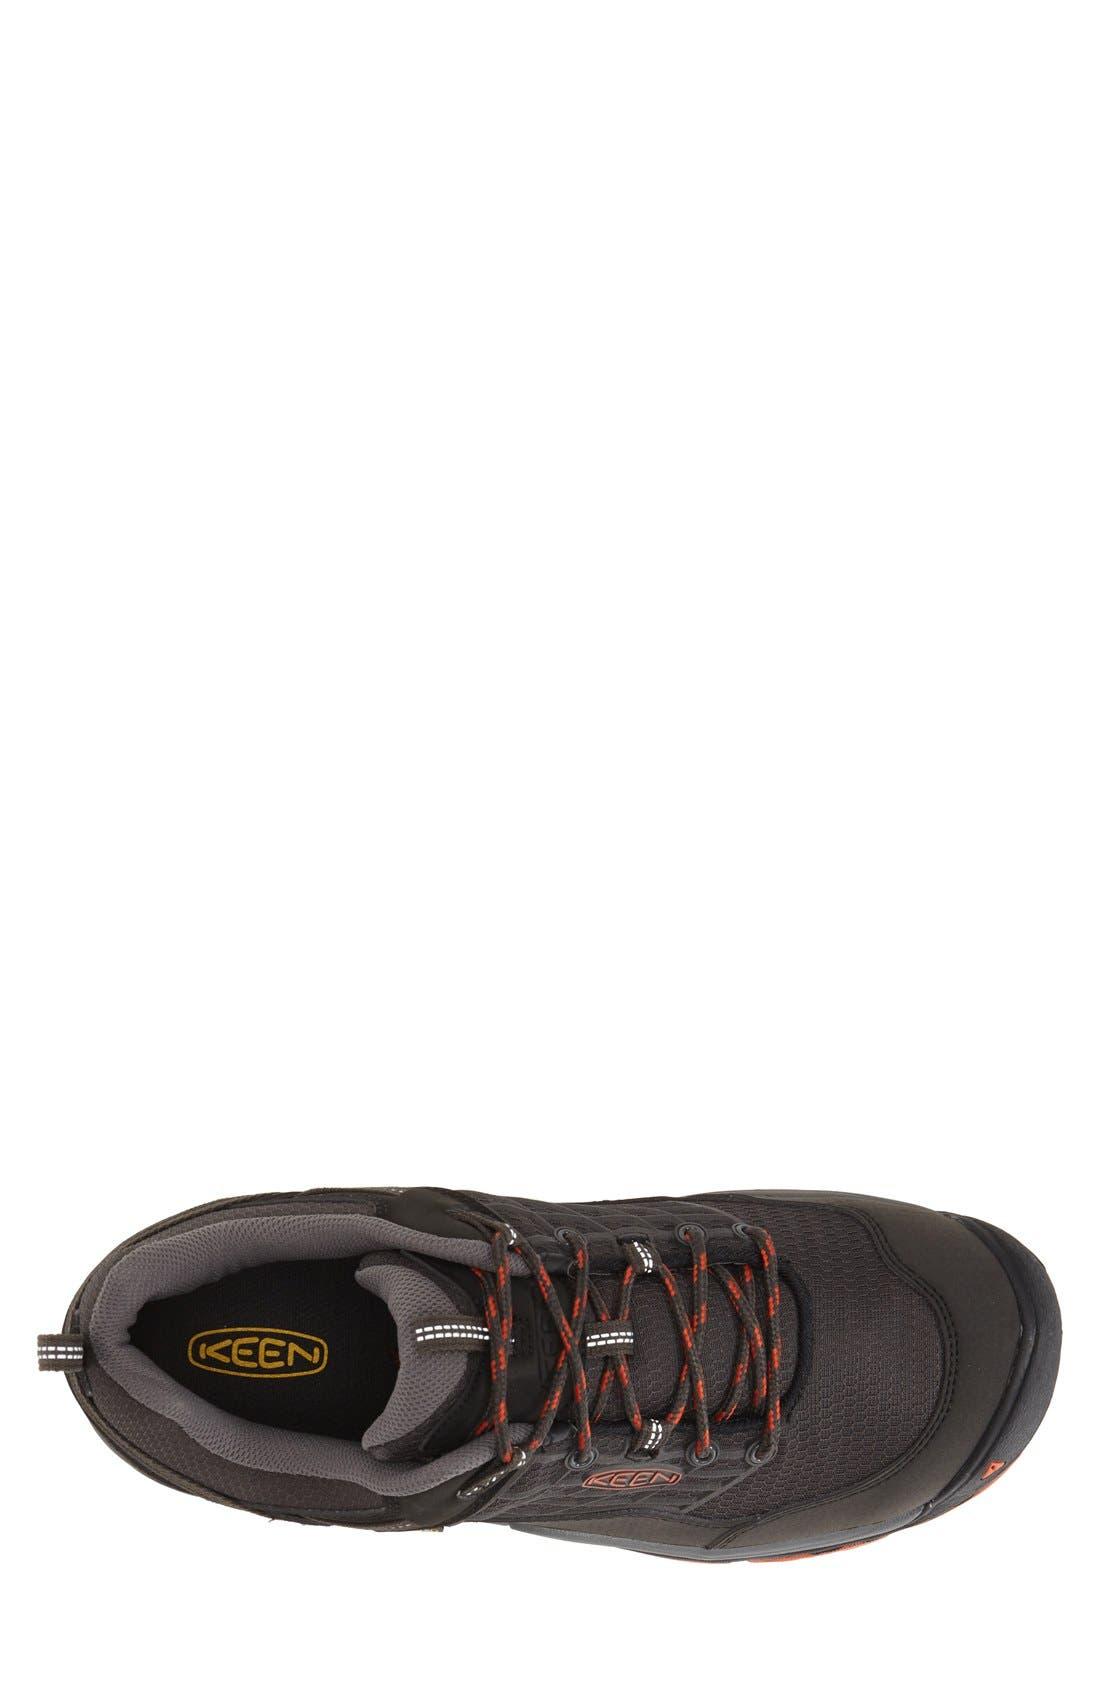 'Saltzman' Waterproof Walking Shoe,                             Alternate thumbnail 3, color,                             RAVEN/ KOI